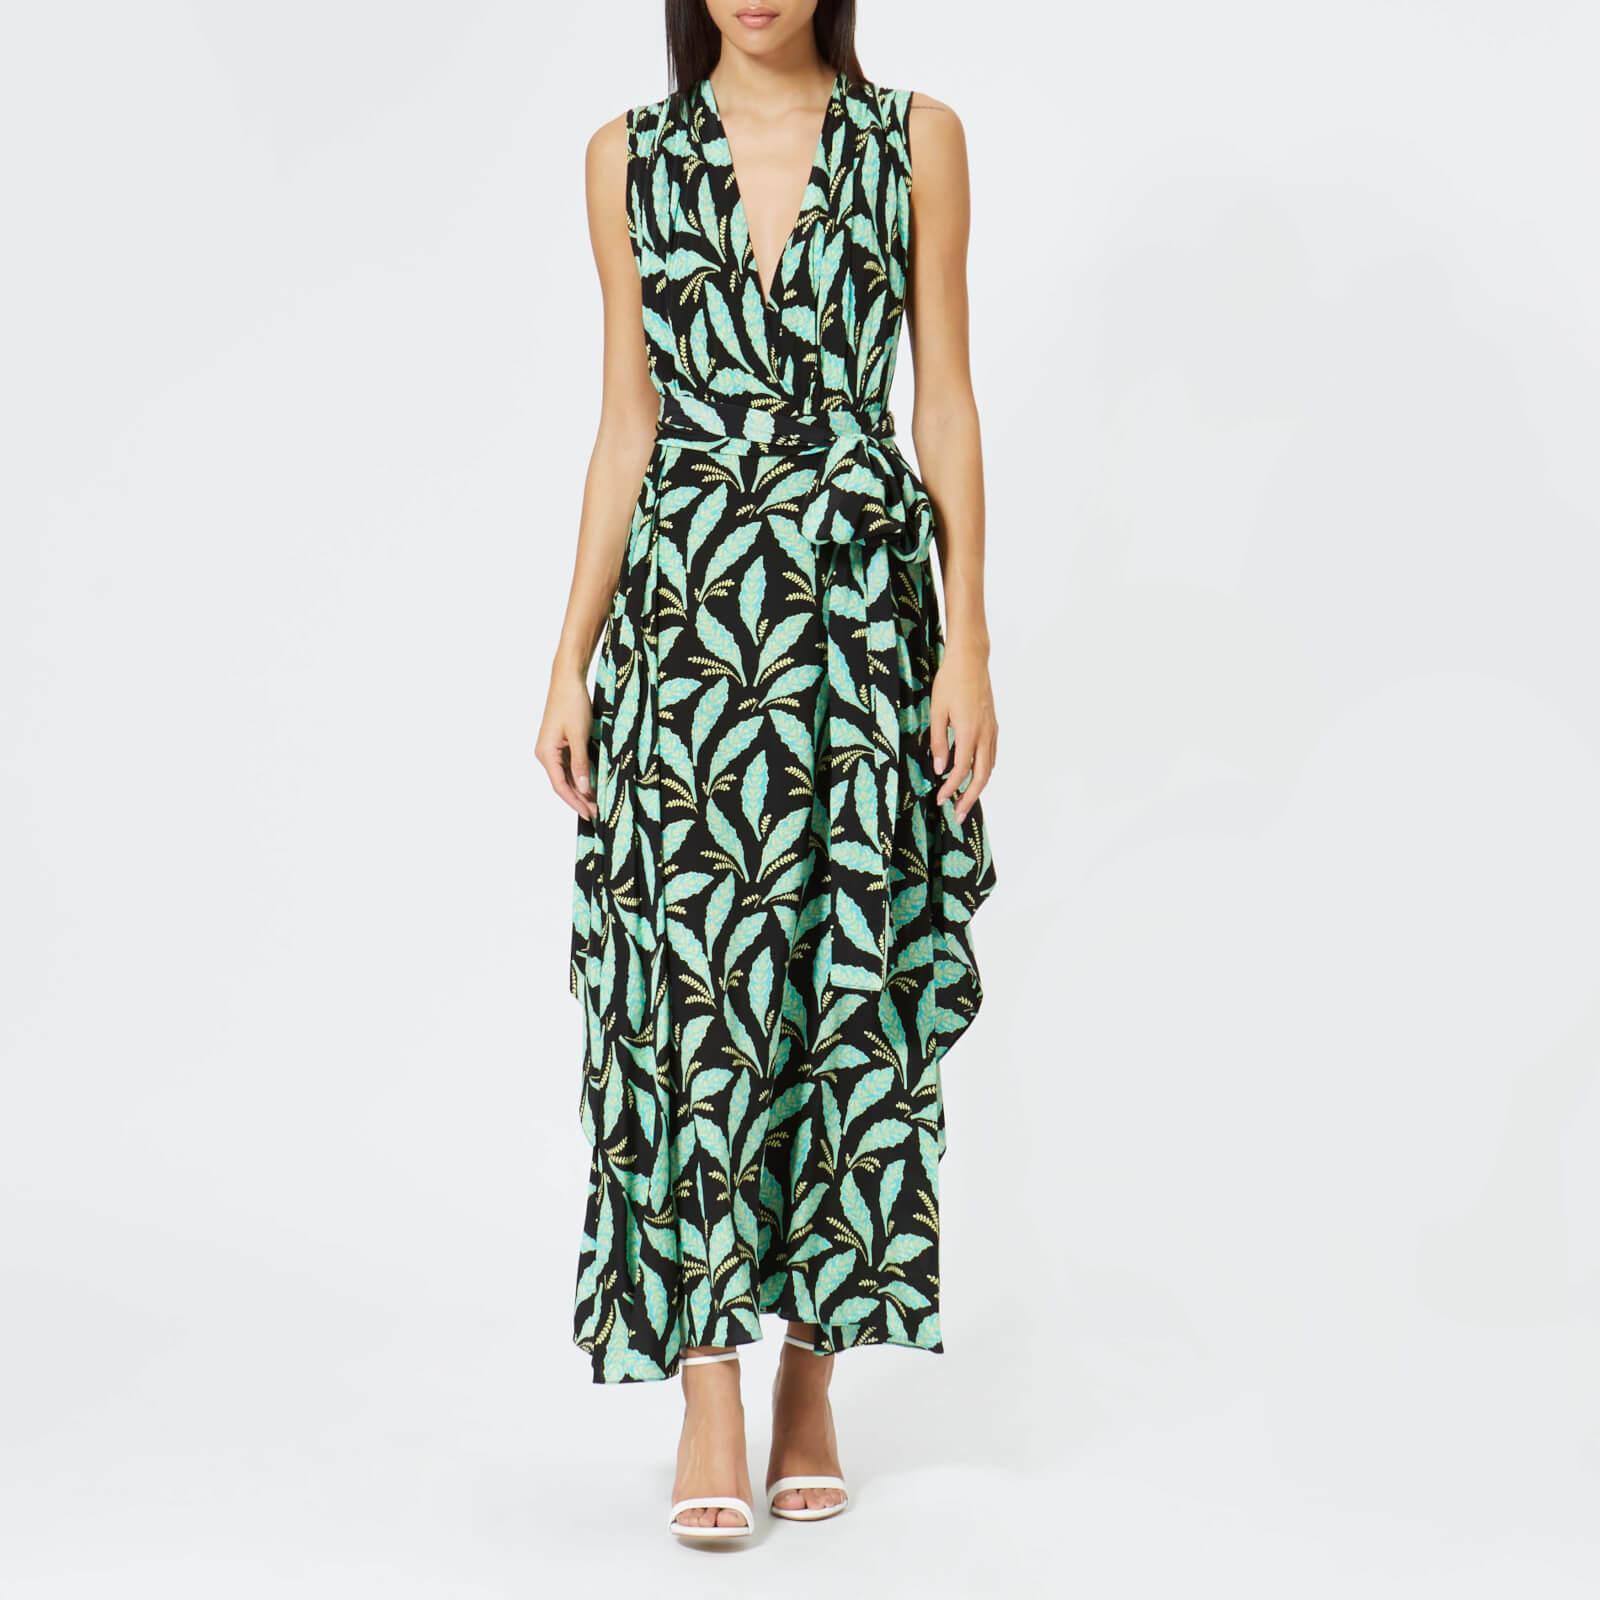 fa1cf41ba471 Diane von Furstenberg Women s Sleeveless Draped V Neck Maxi Dress - Mason  Black - Free UK Delivery over £50